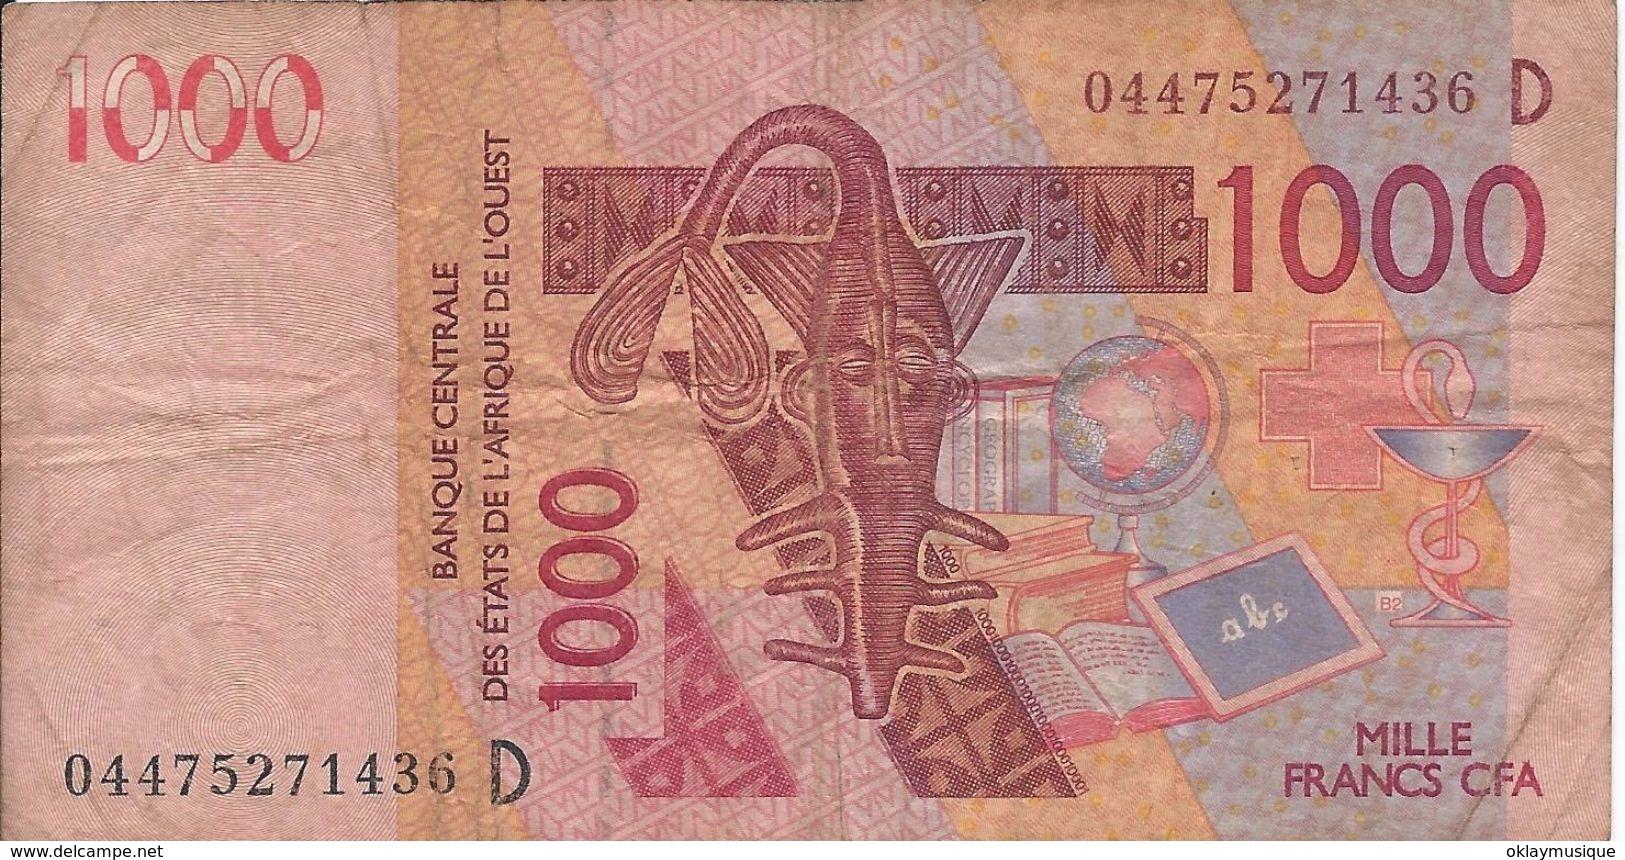 1000 Francs 2003  Mali - Mali